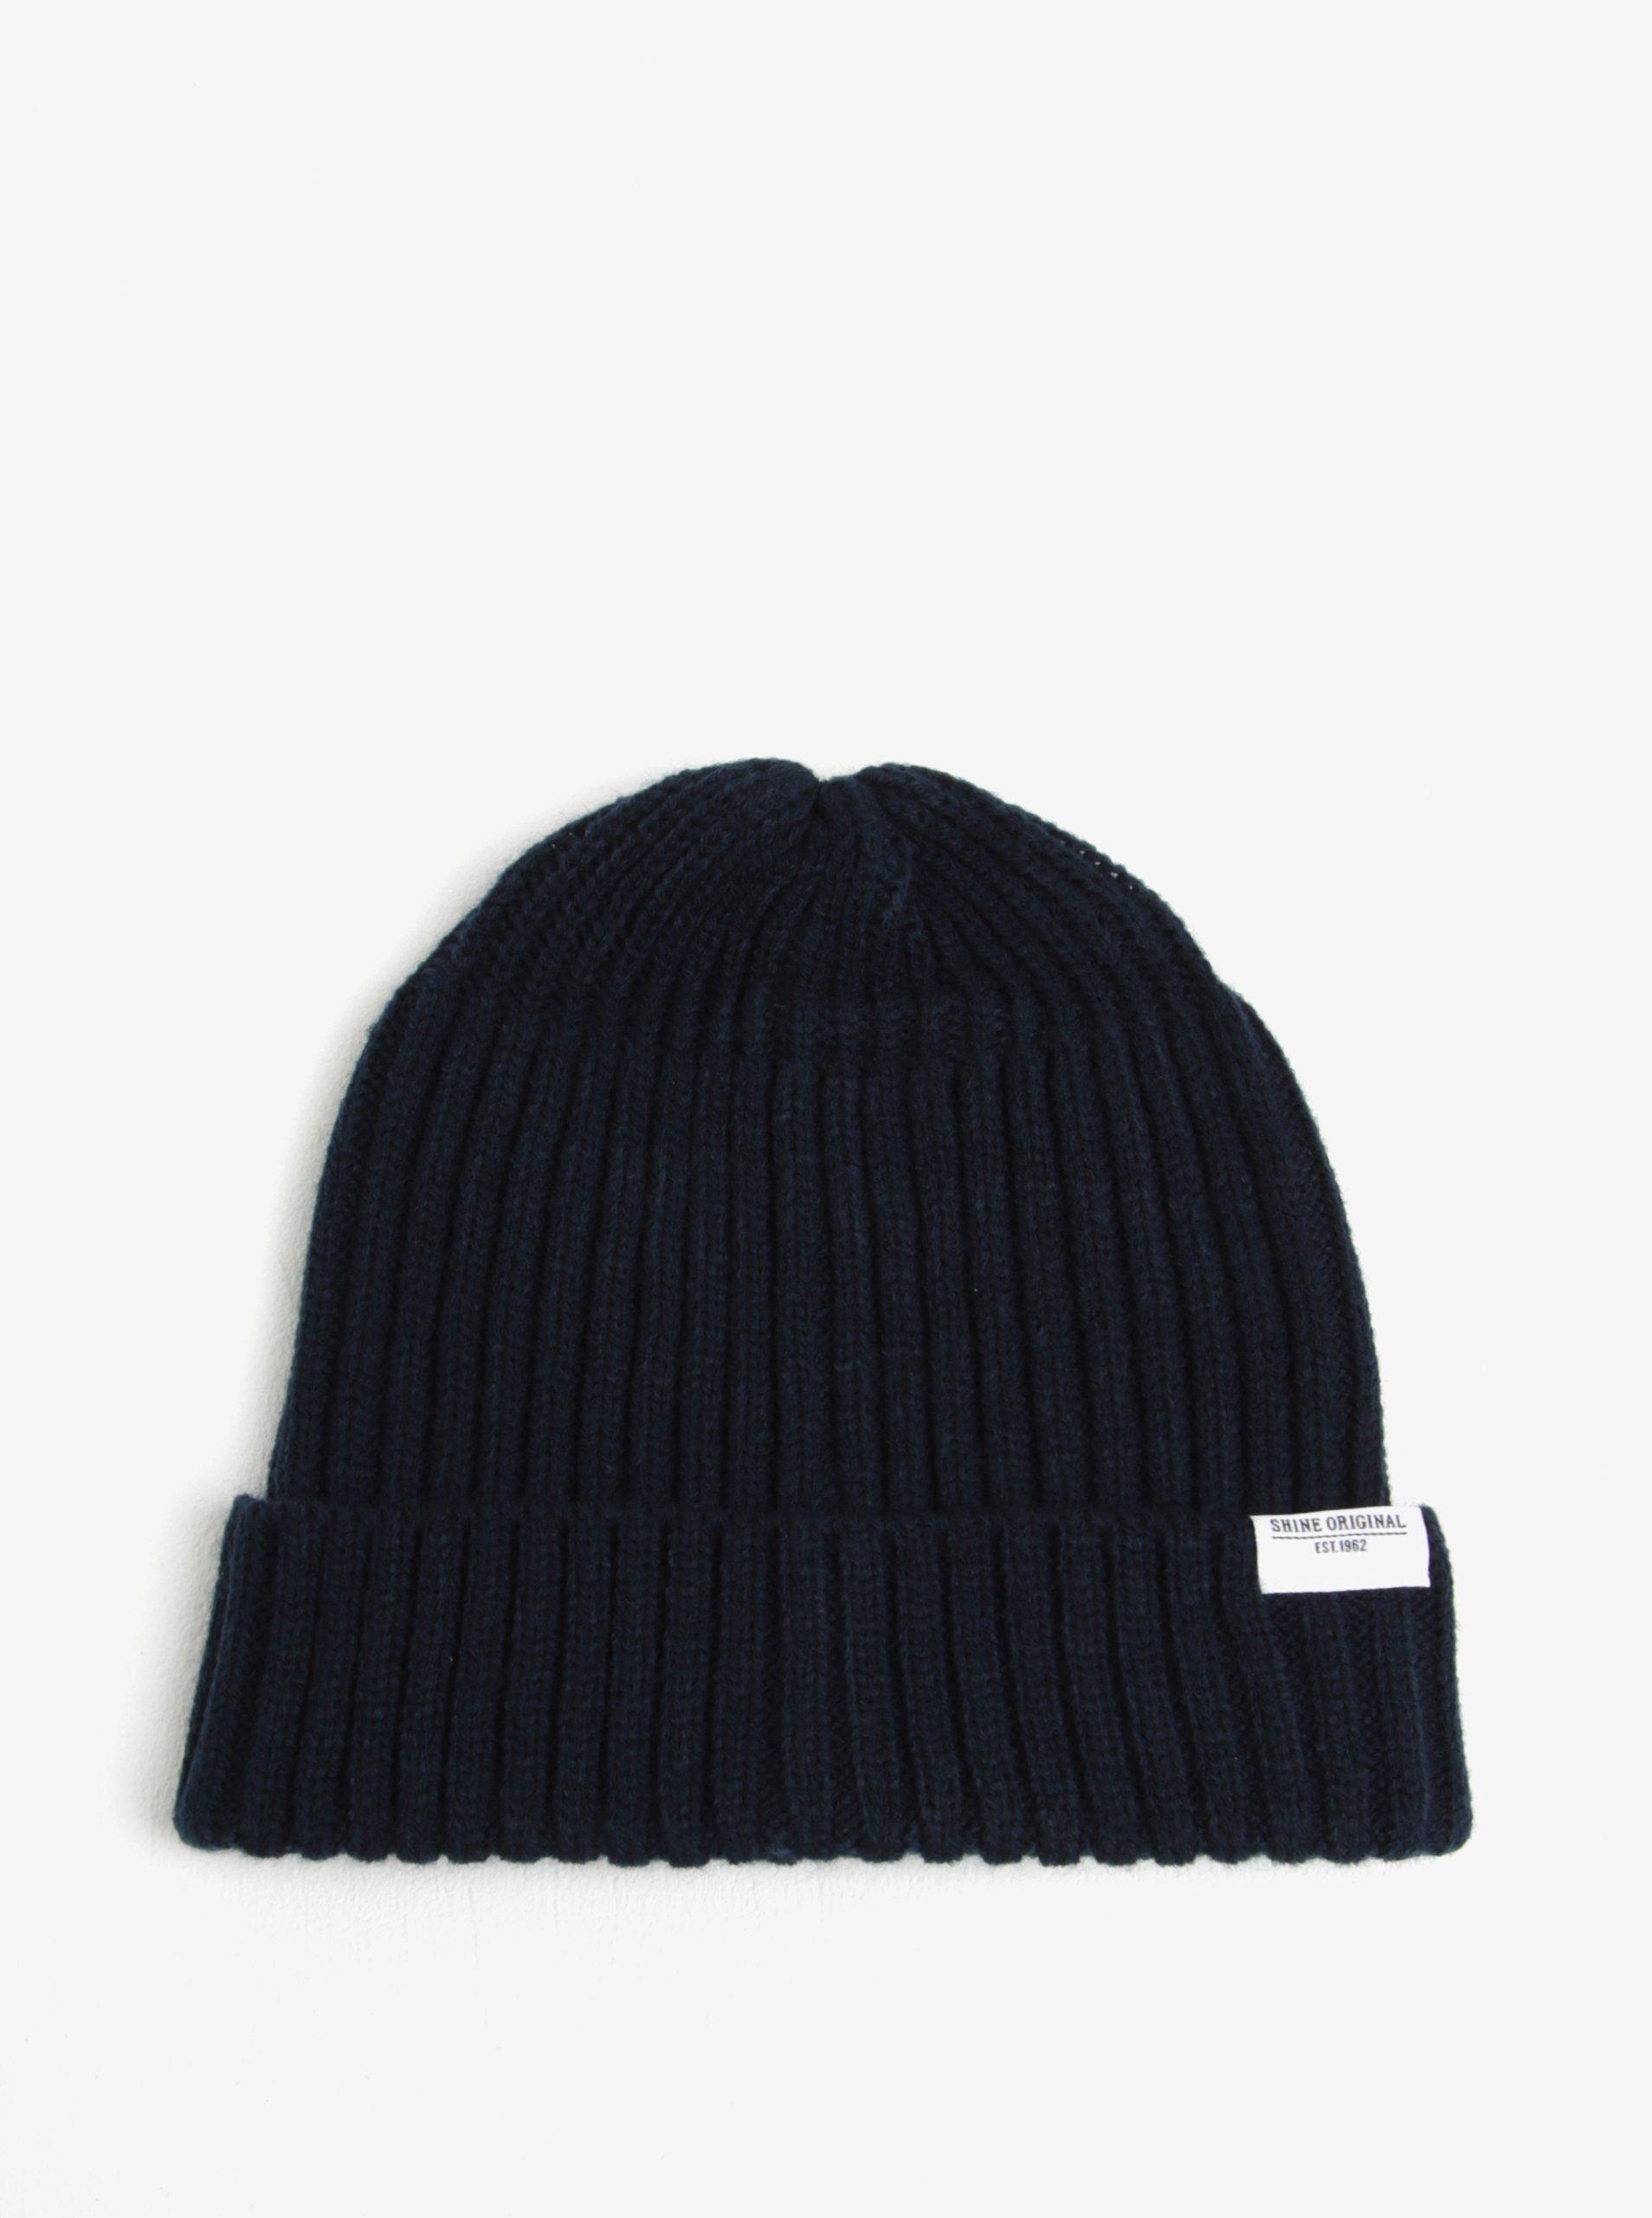 Tmavě modrá čepice Shine Original